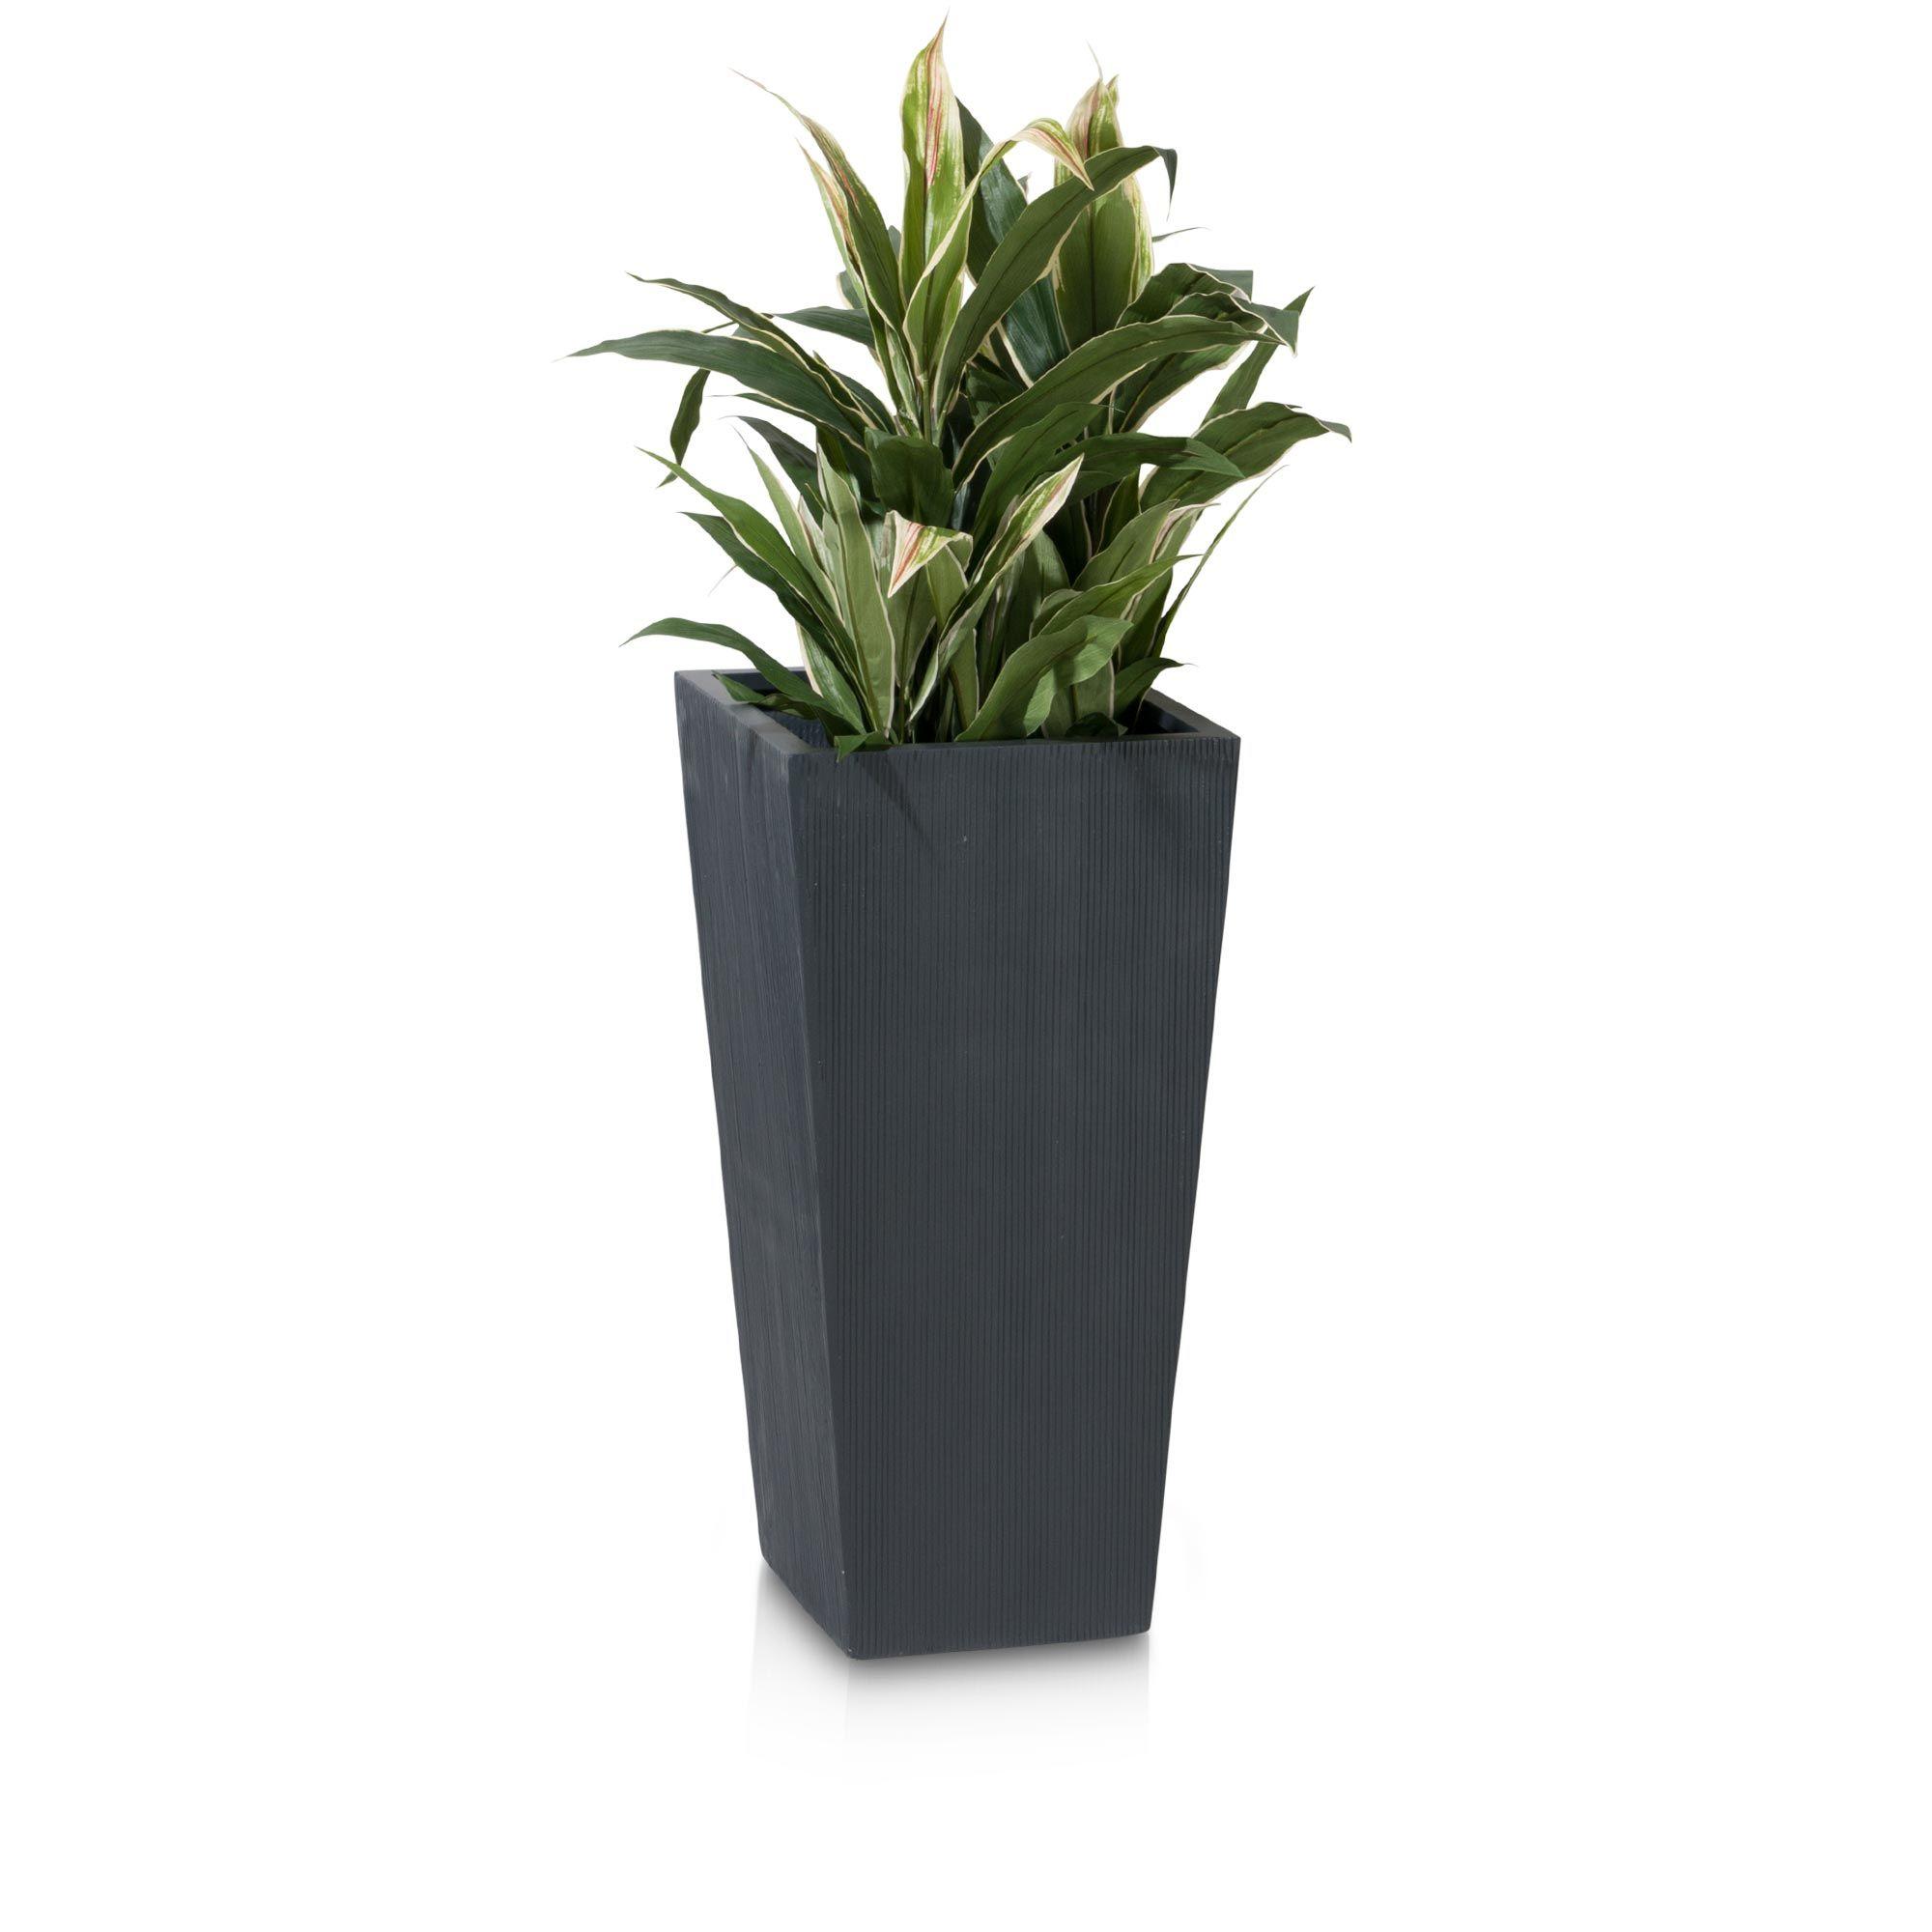 Lavia 70 Is A Plant Pot Made Of Fibreglass It Has A Modern Shape